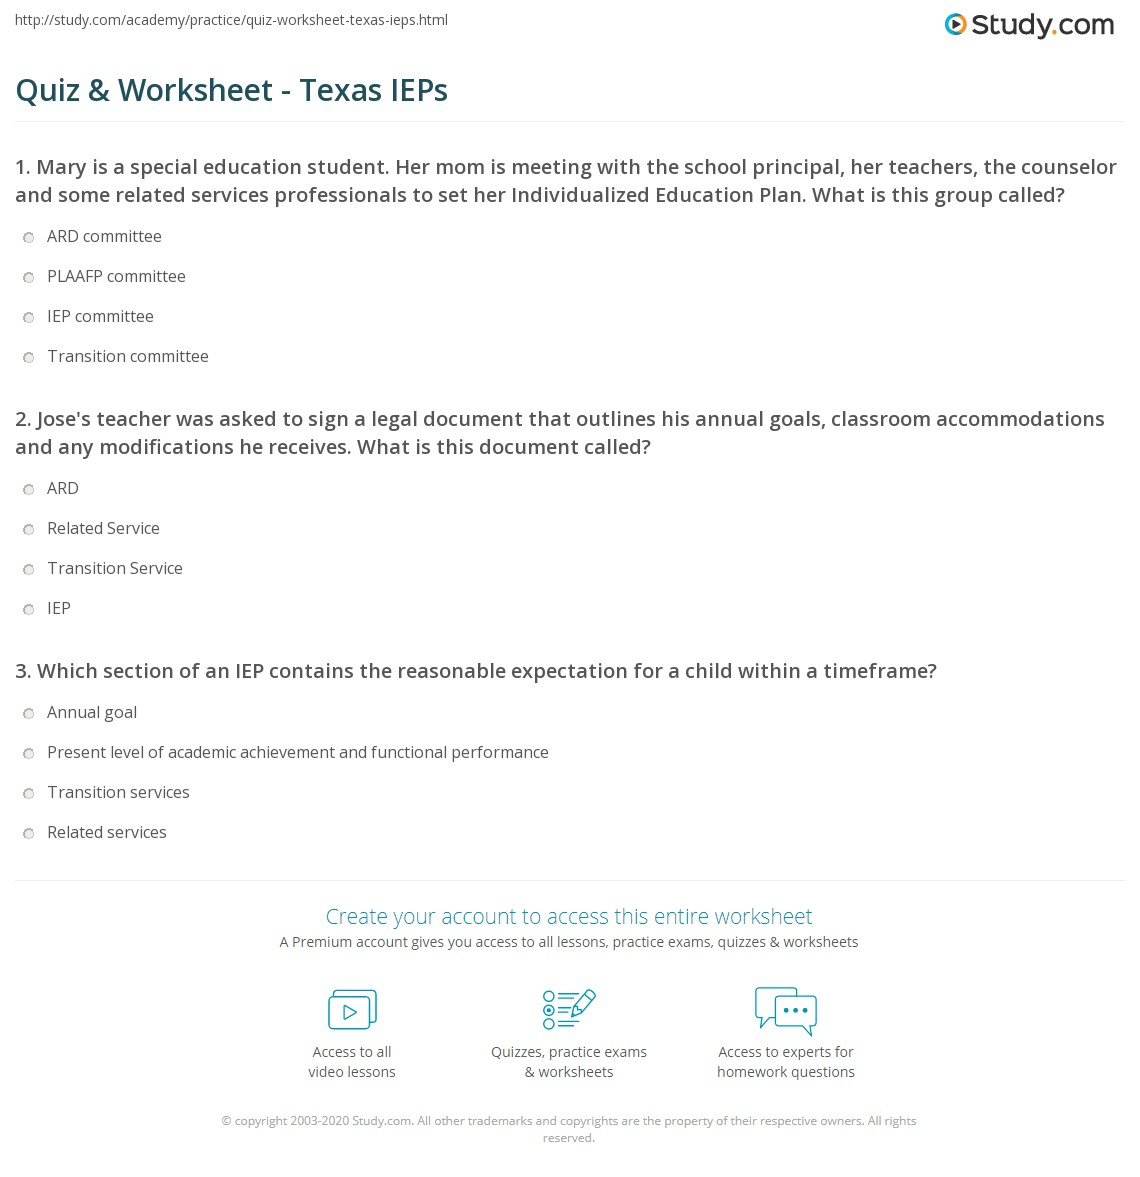 Quiz & Worksheet - Texas IEPs | Study.com